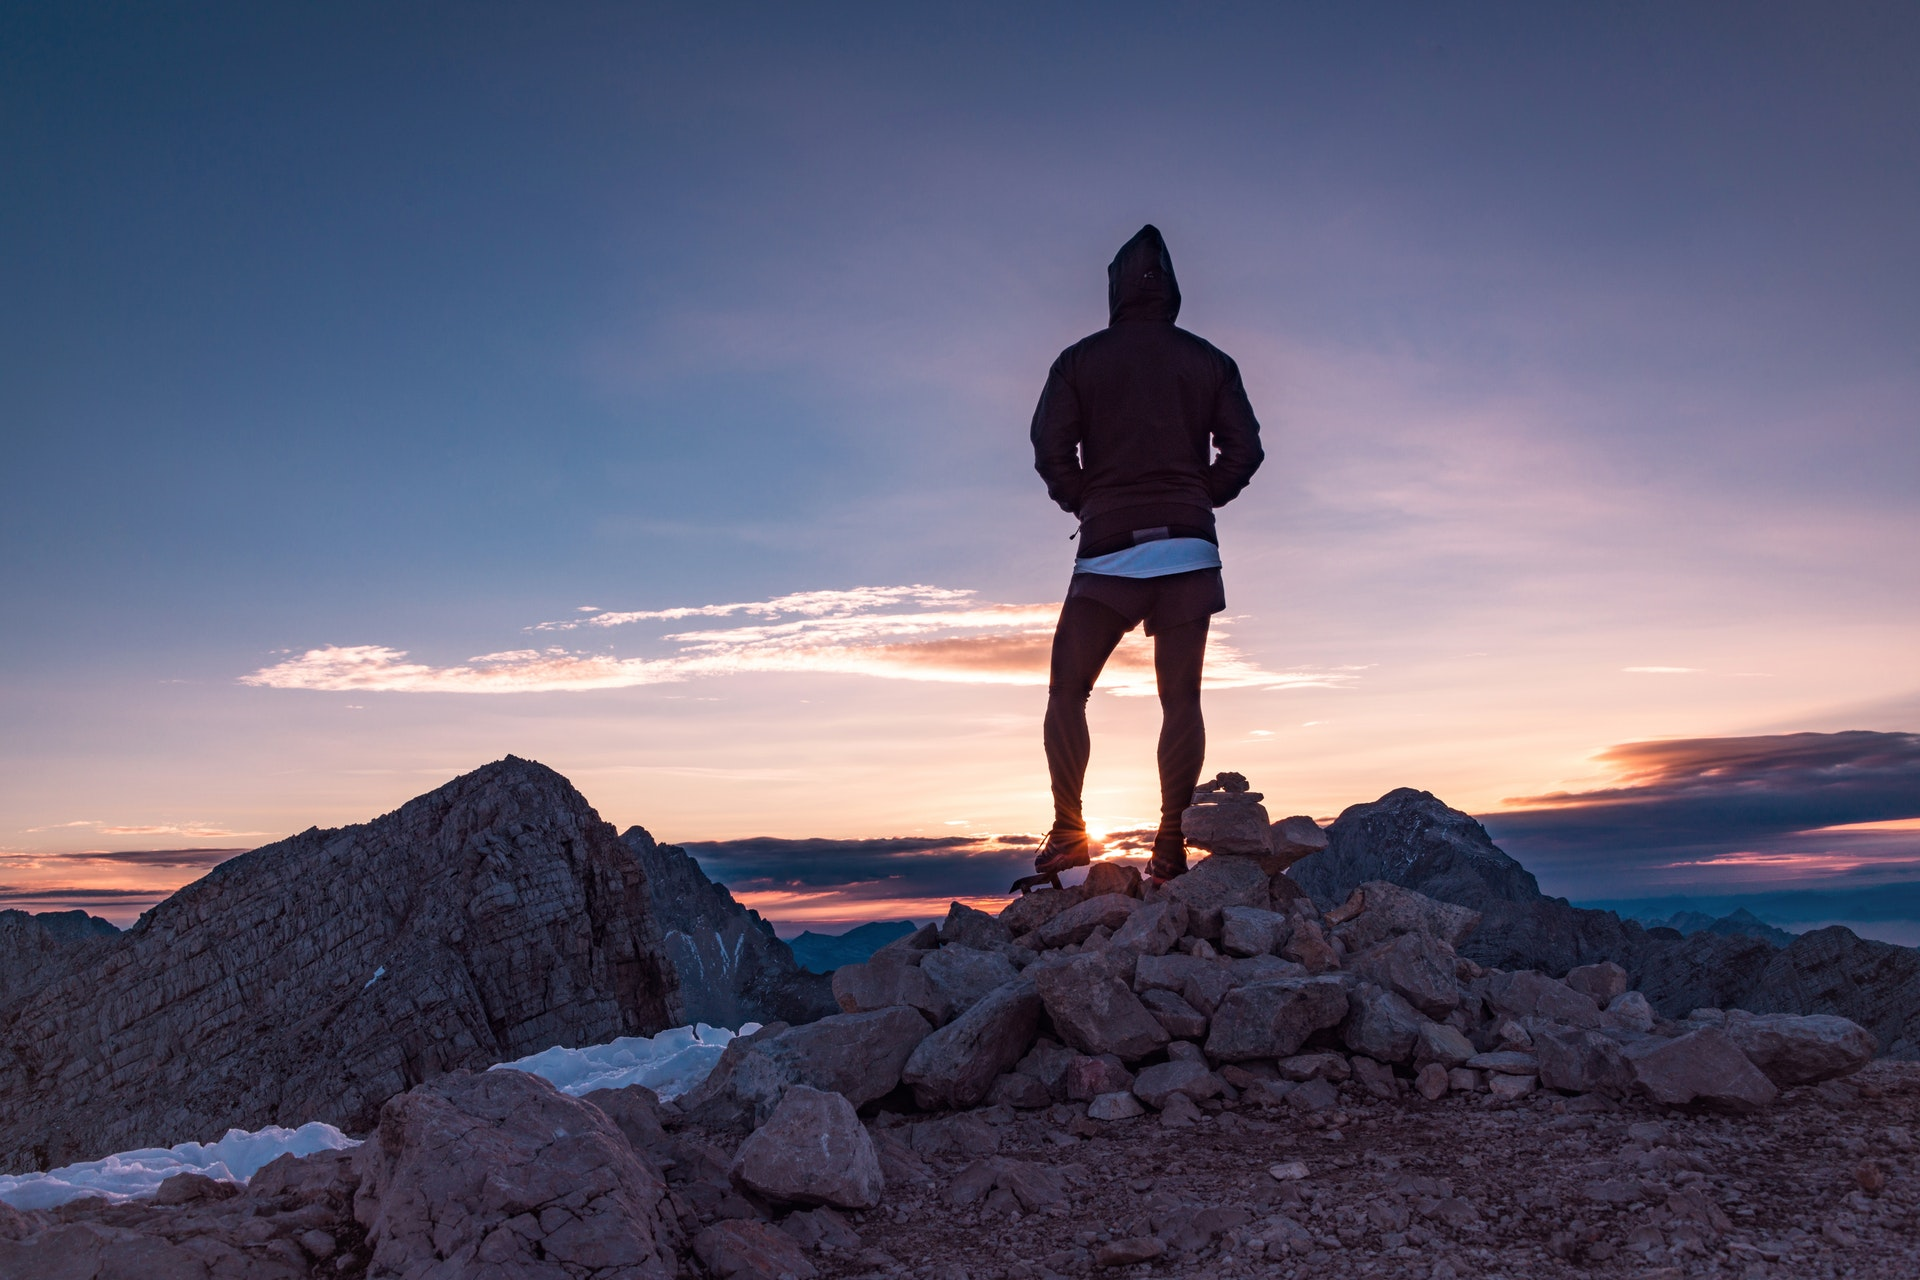 Raggiungere mete ambiziose in tutta tranquillità